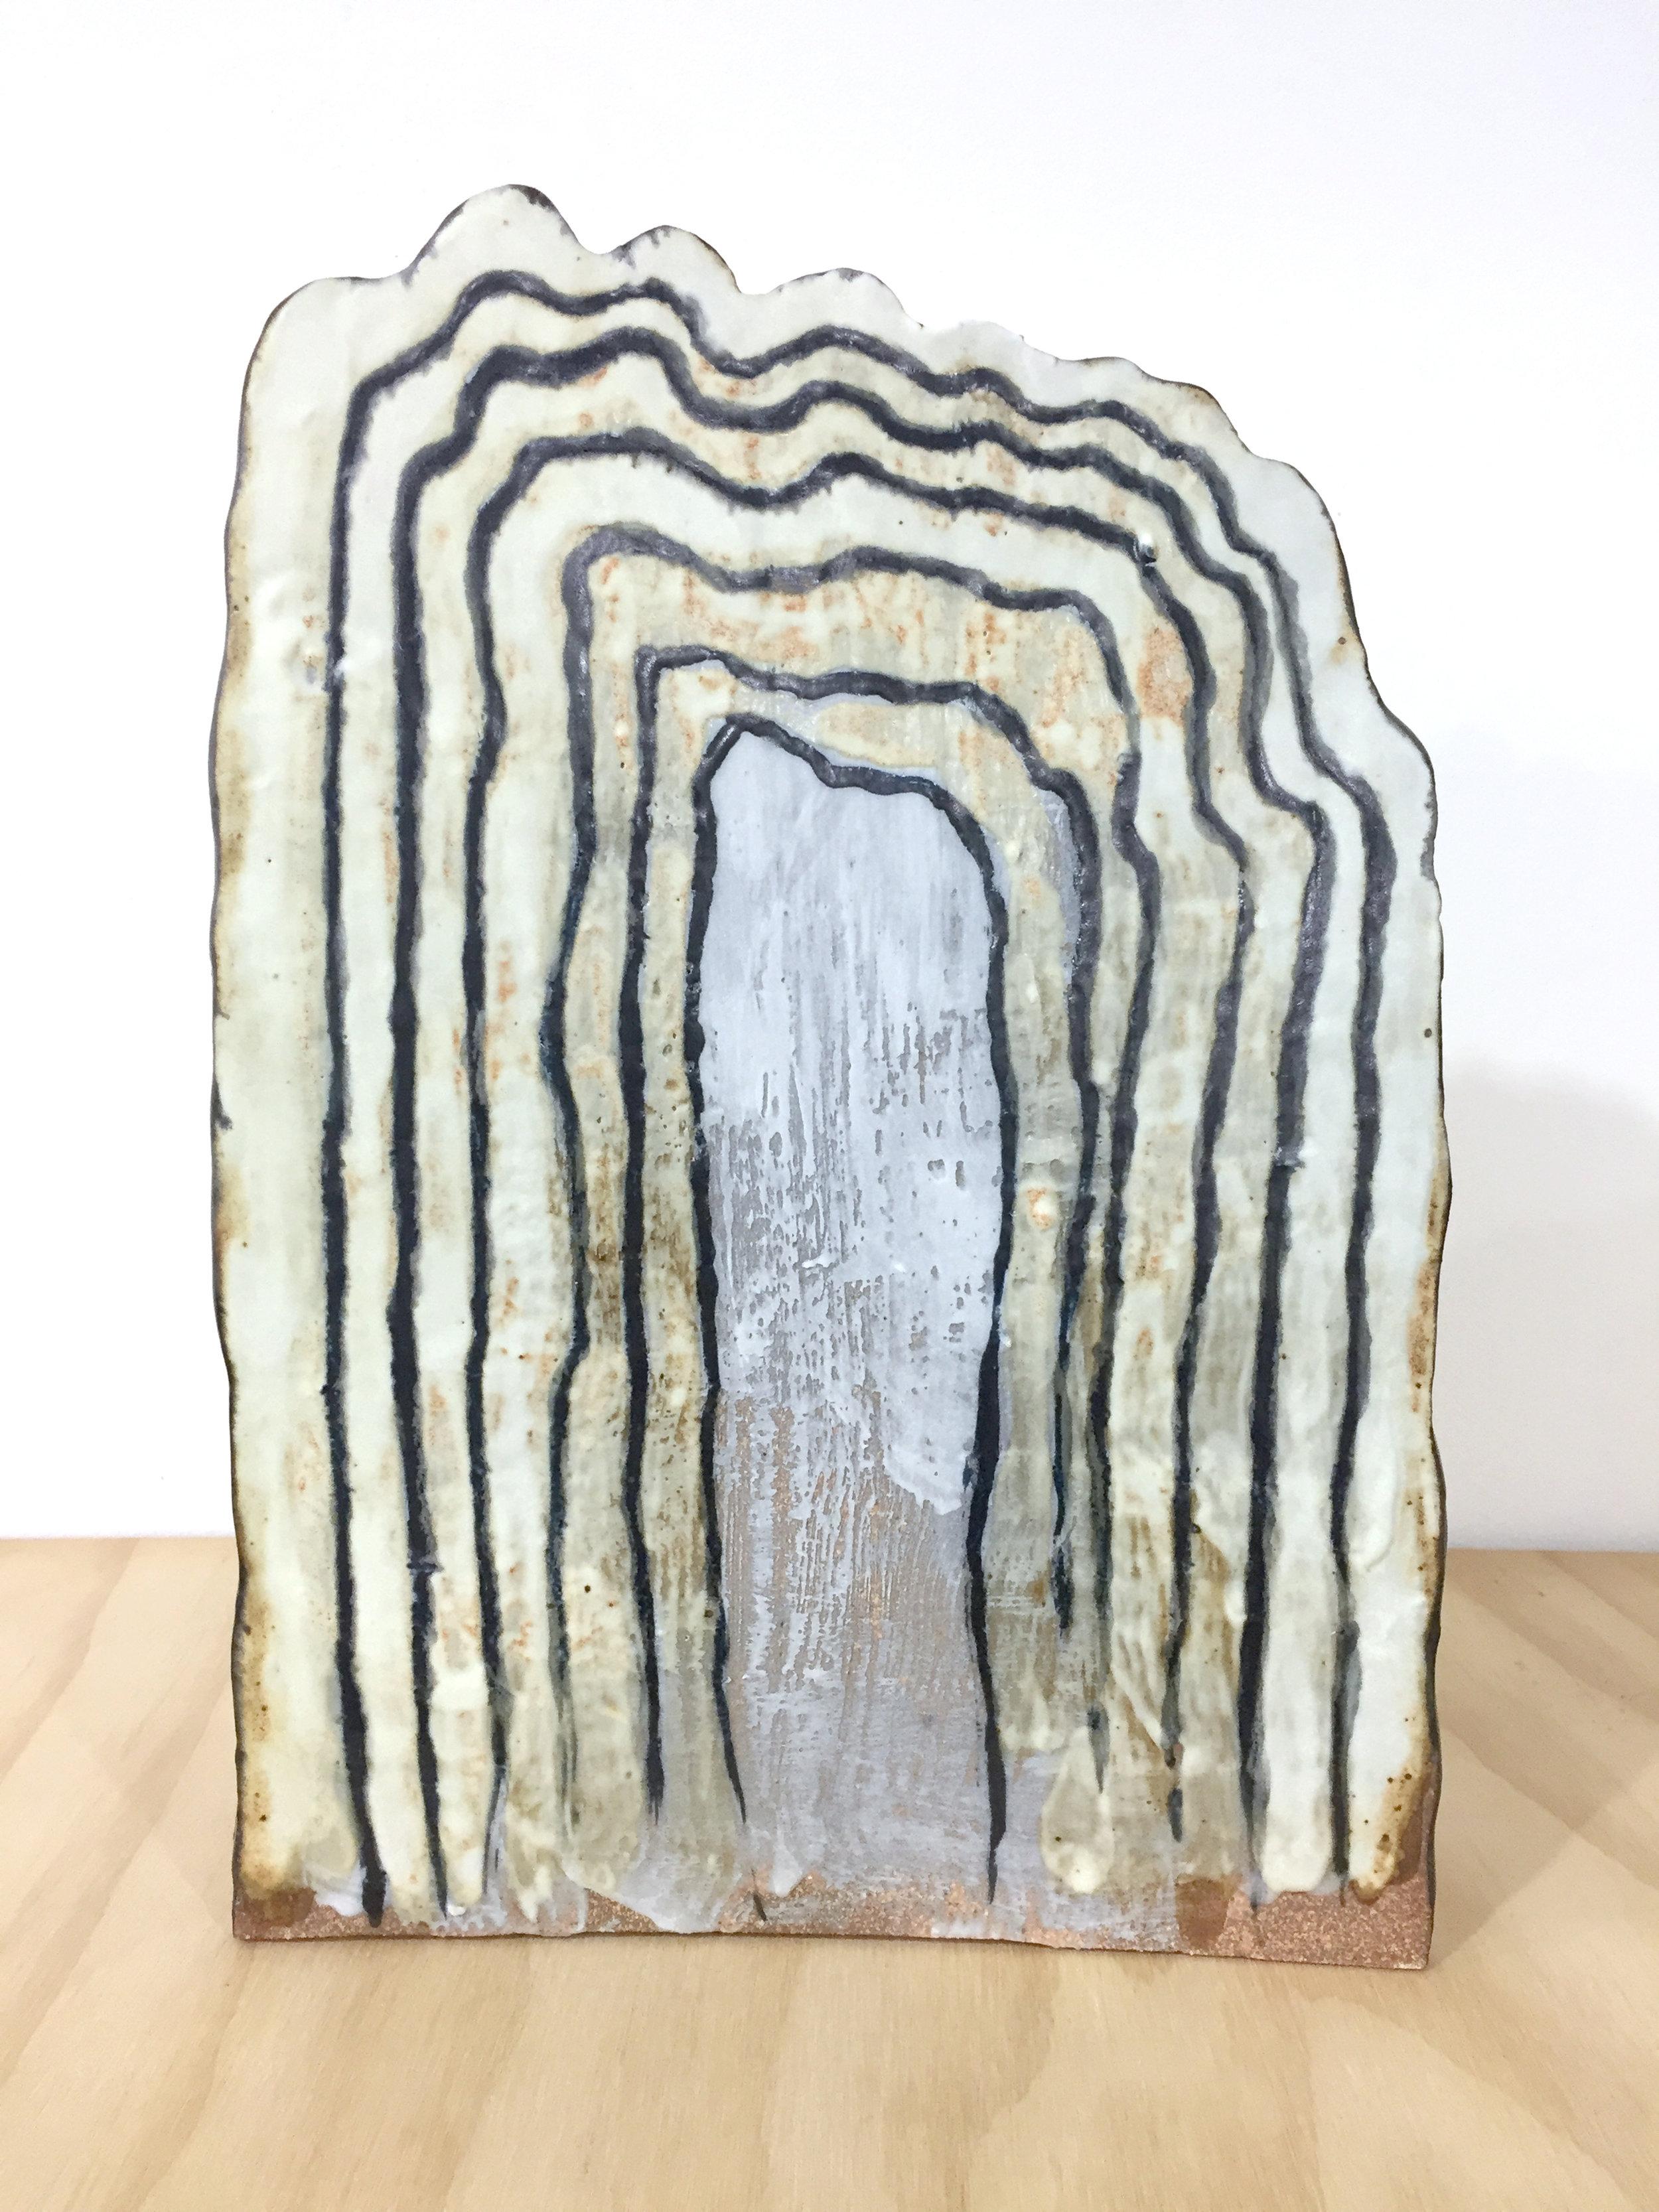 Keiko Narahashi   Untitled (Wavy White Black Lines) , 2017 Glazed stoneware 14 1/4 x 10 x 6 1/2 inches 36.2 x 25.4 x 16.5 cm